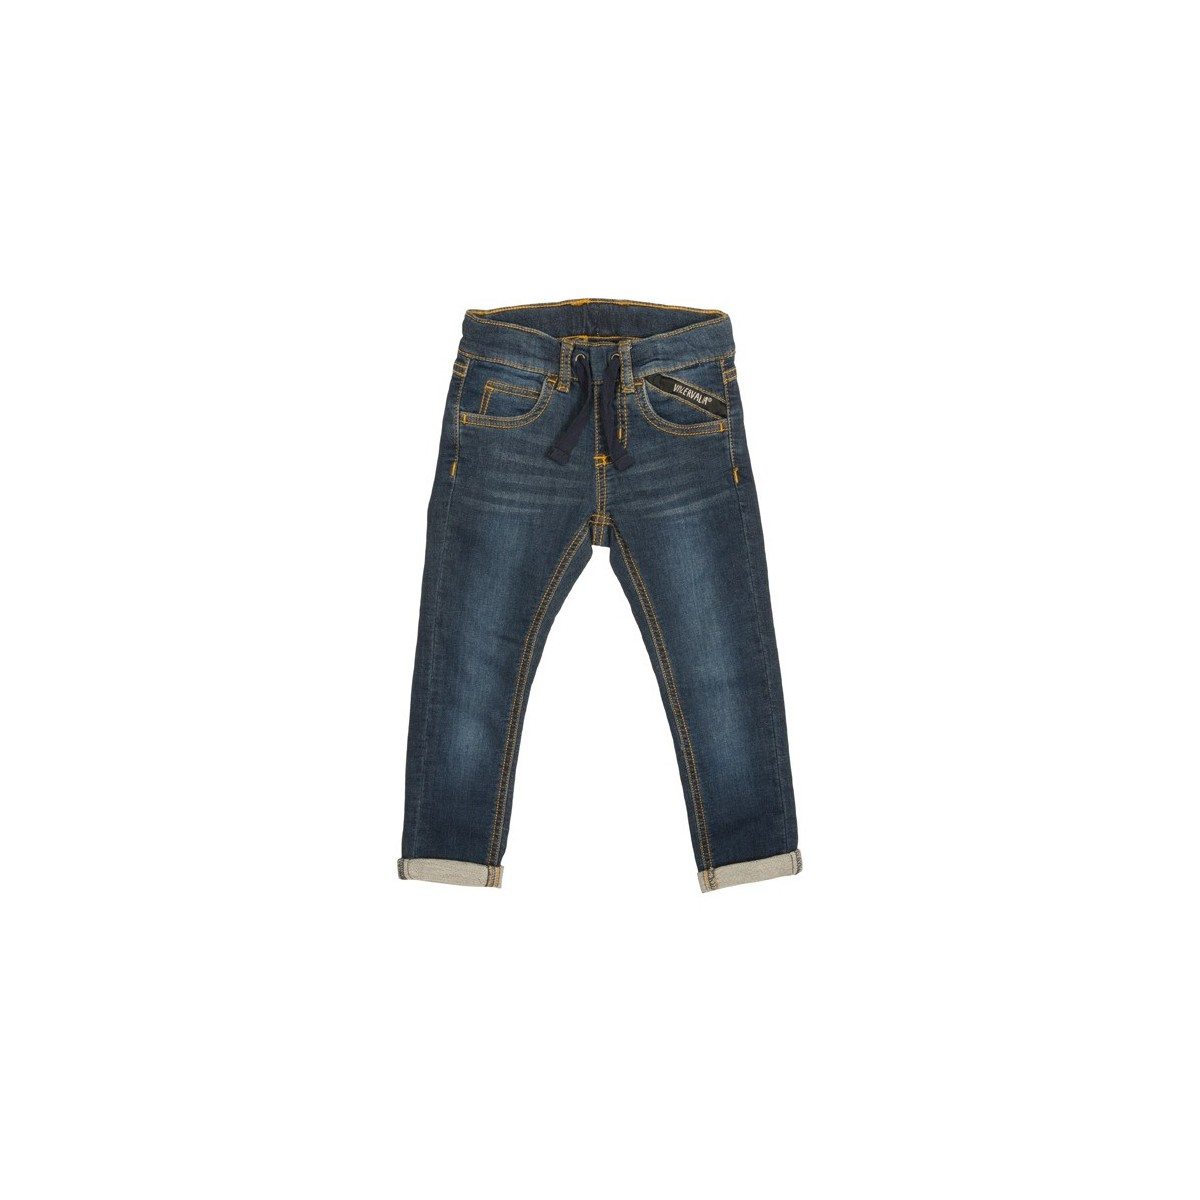 2e81cf3c5 Villervalla - Slim Fit jeans